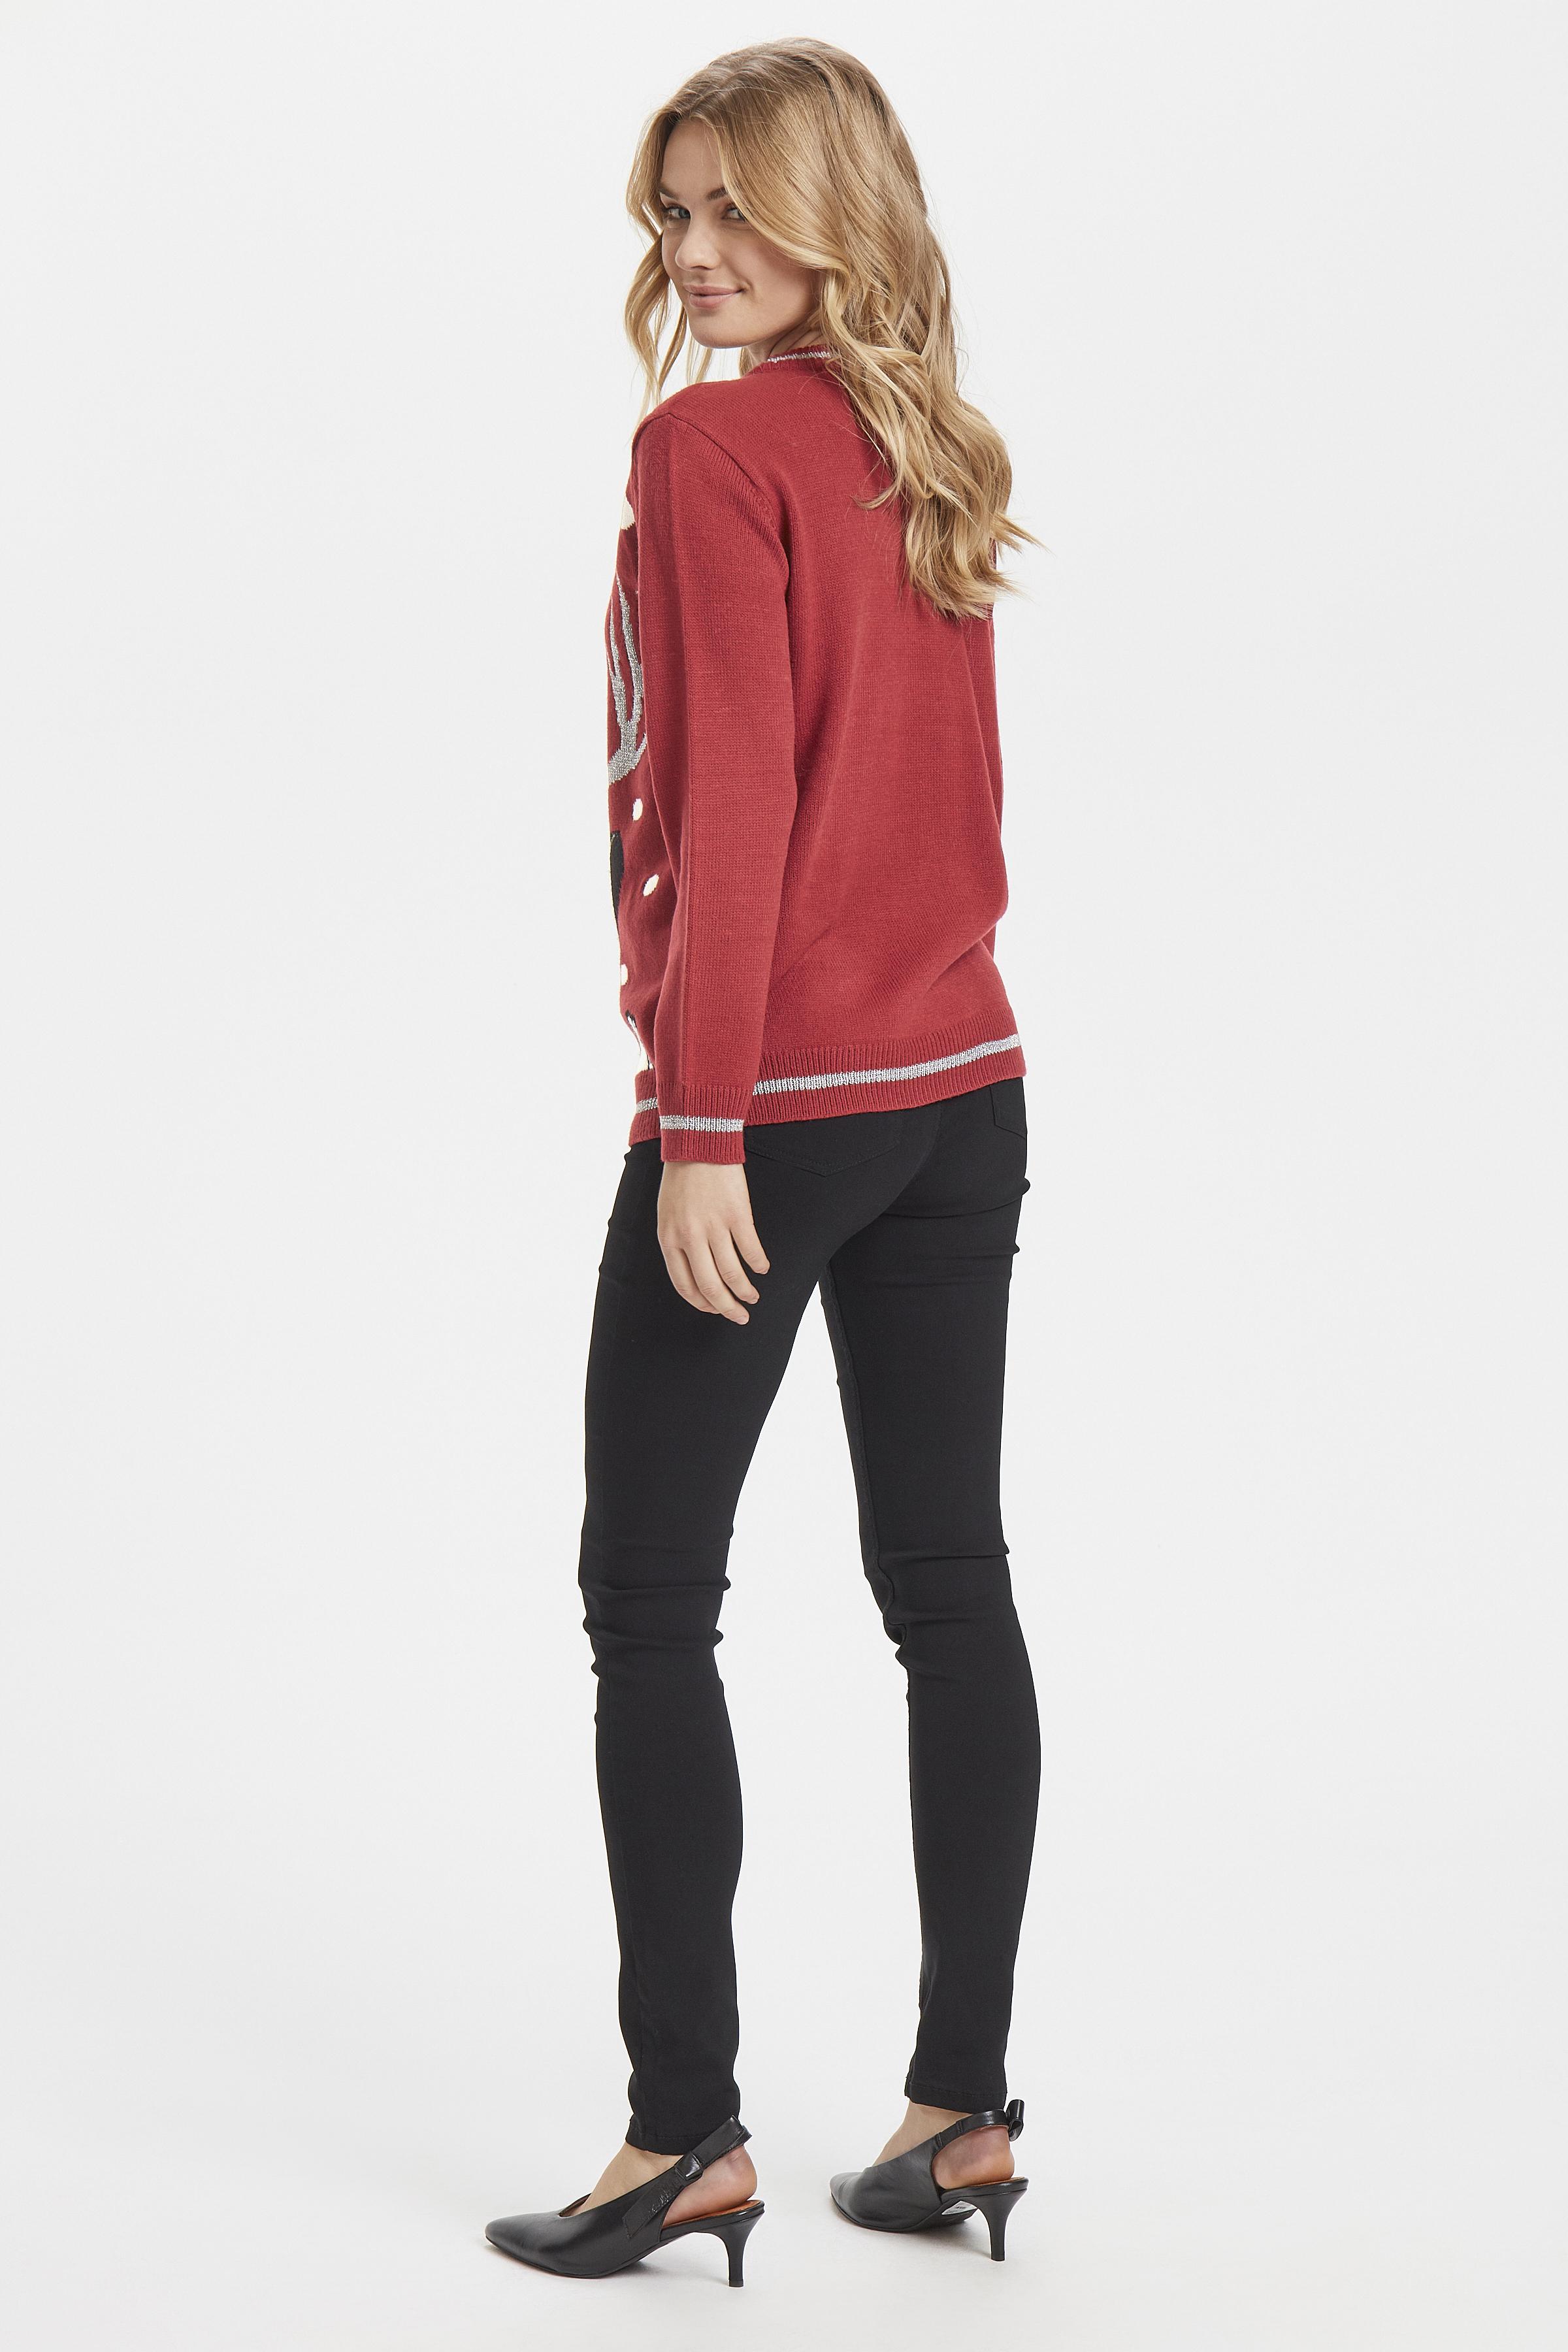 Blood Red Combi 1 Stickad pullover från b.young – Köp Blood Red Combi 1 Stickad pullover från storlek XS-XXL här